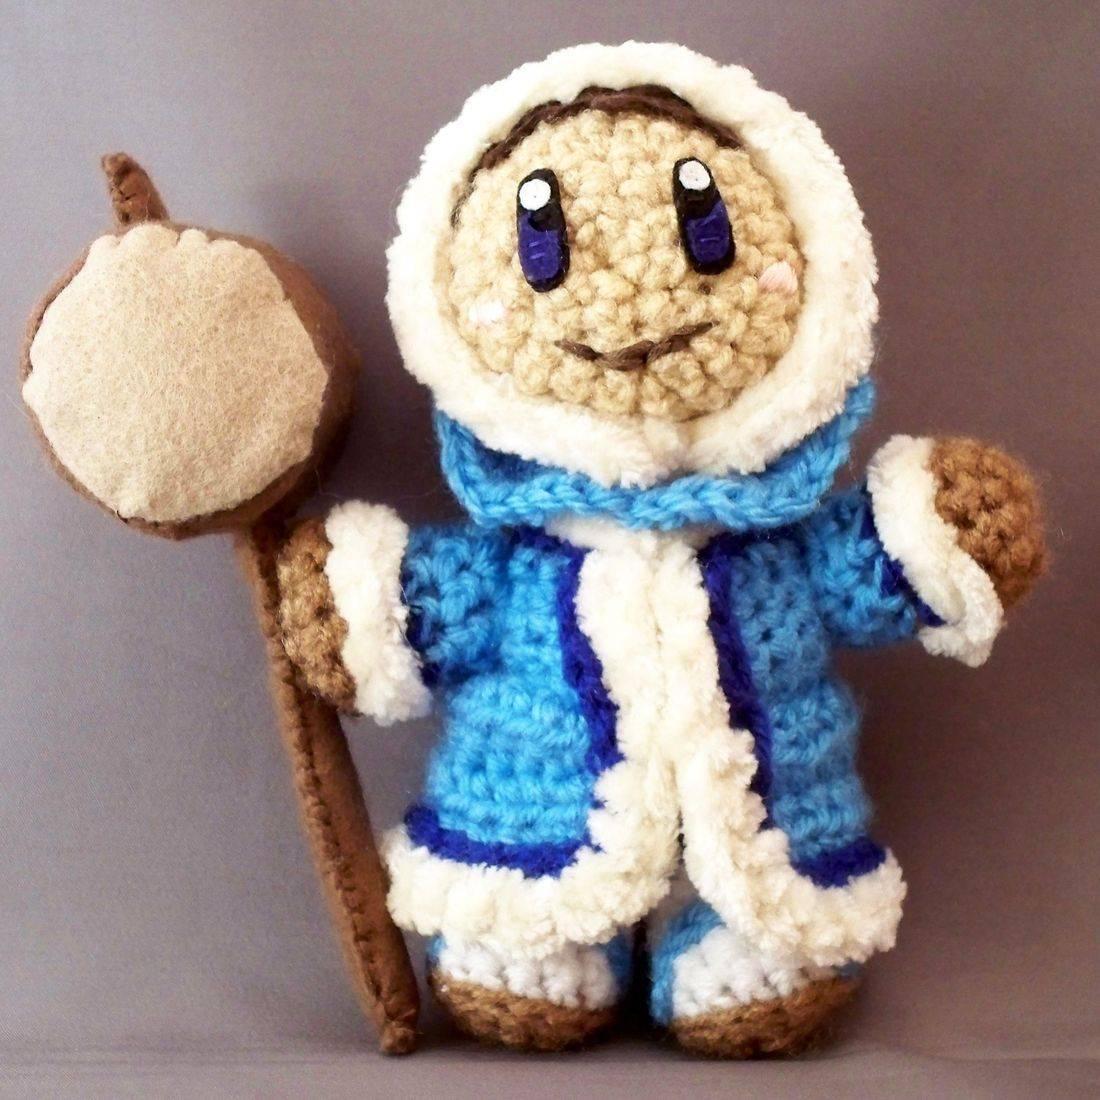 Popo, Ice Climbers, Nintendo, Amigurumi, Crochet, plush, doll, handmade, nerd, video game